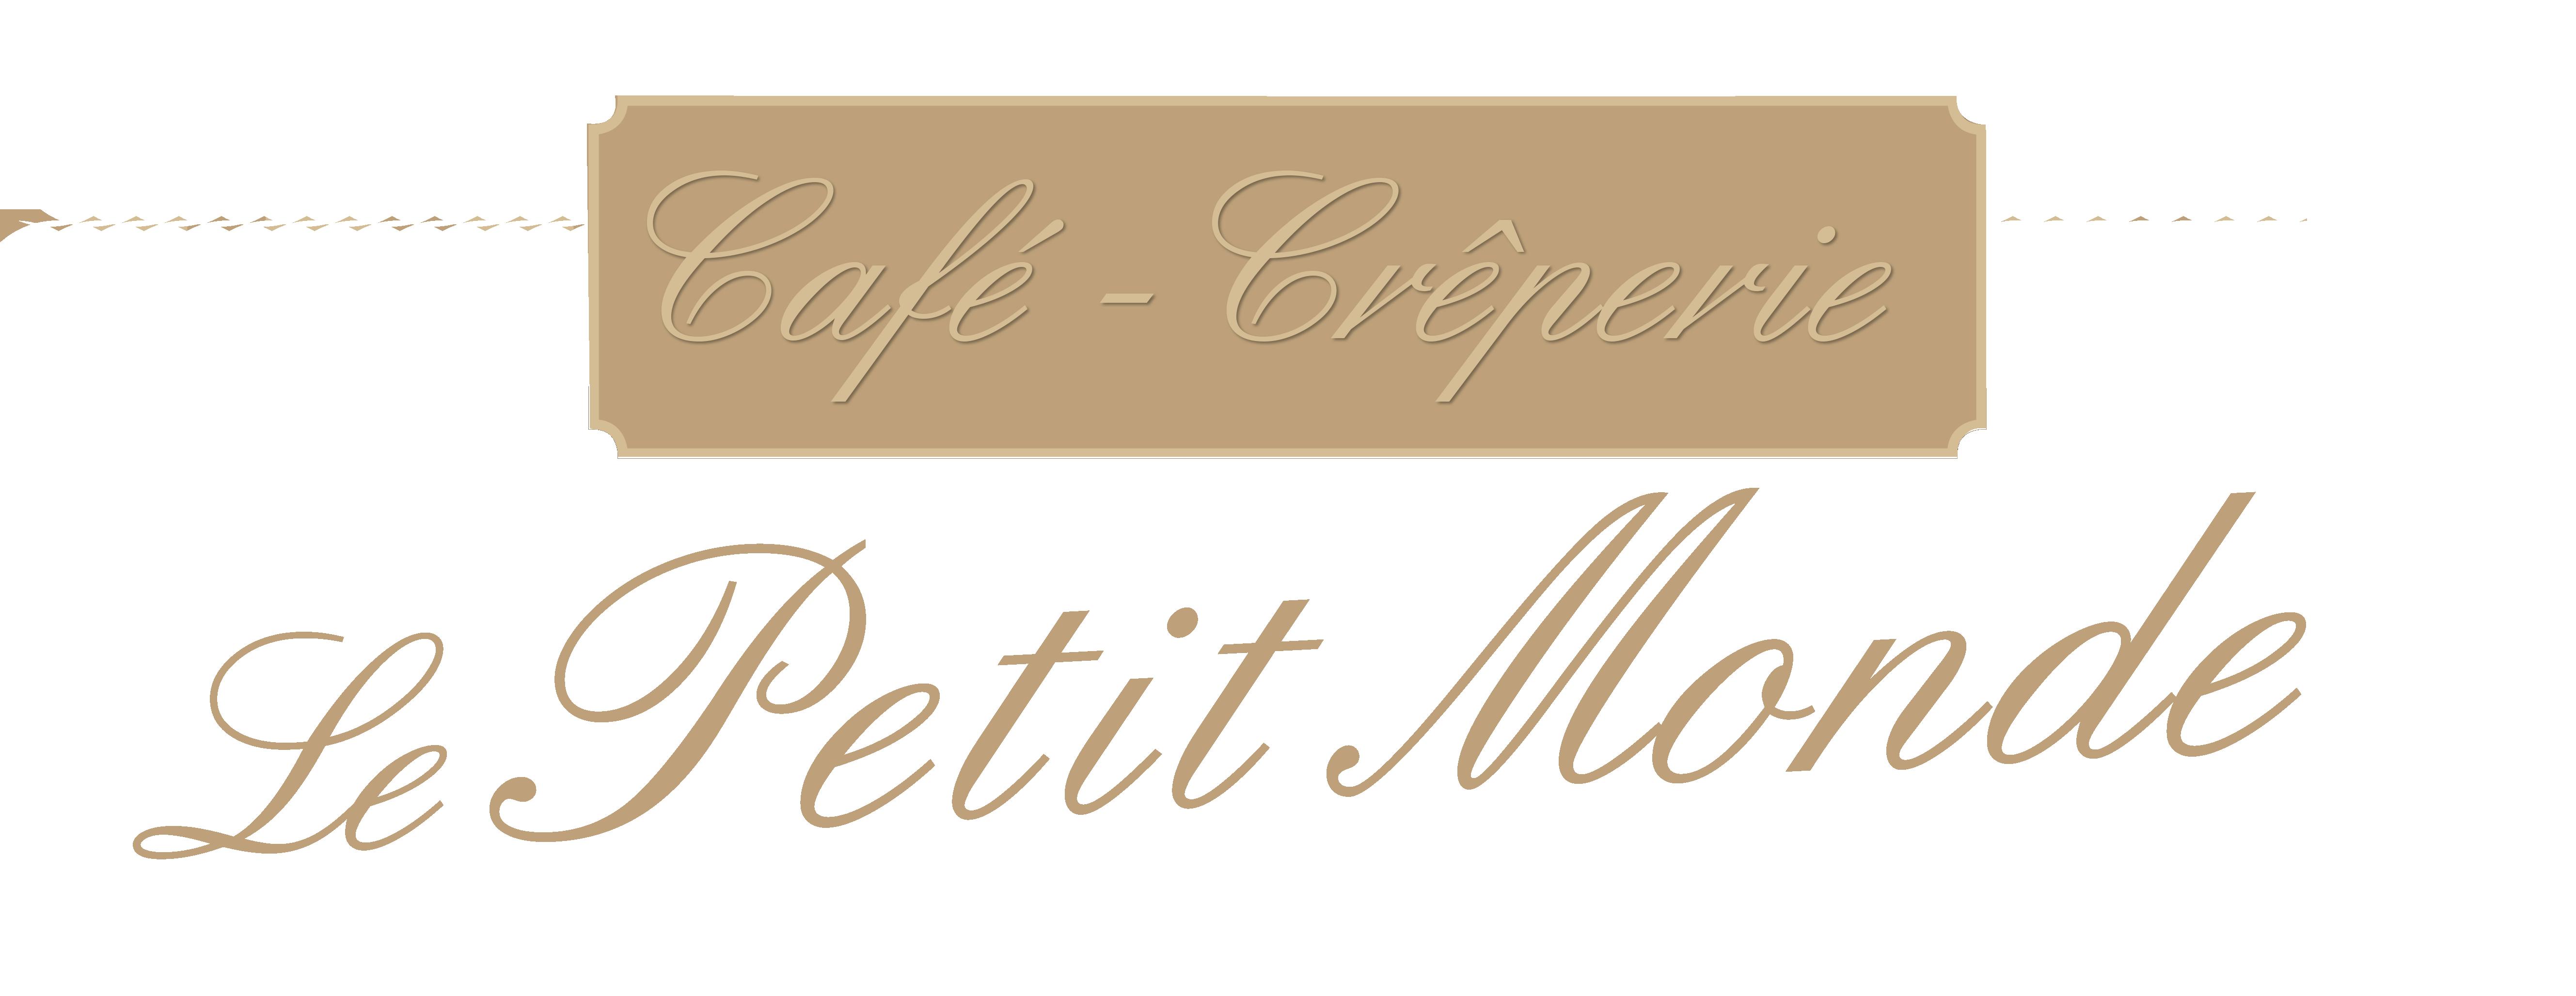 Le Petit Monde Logo